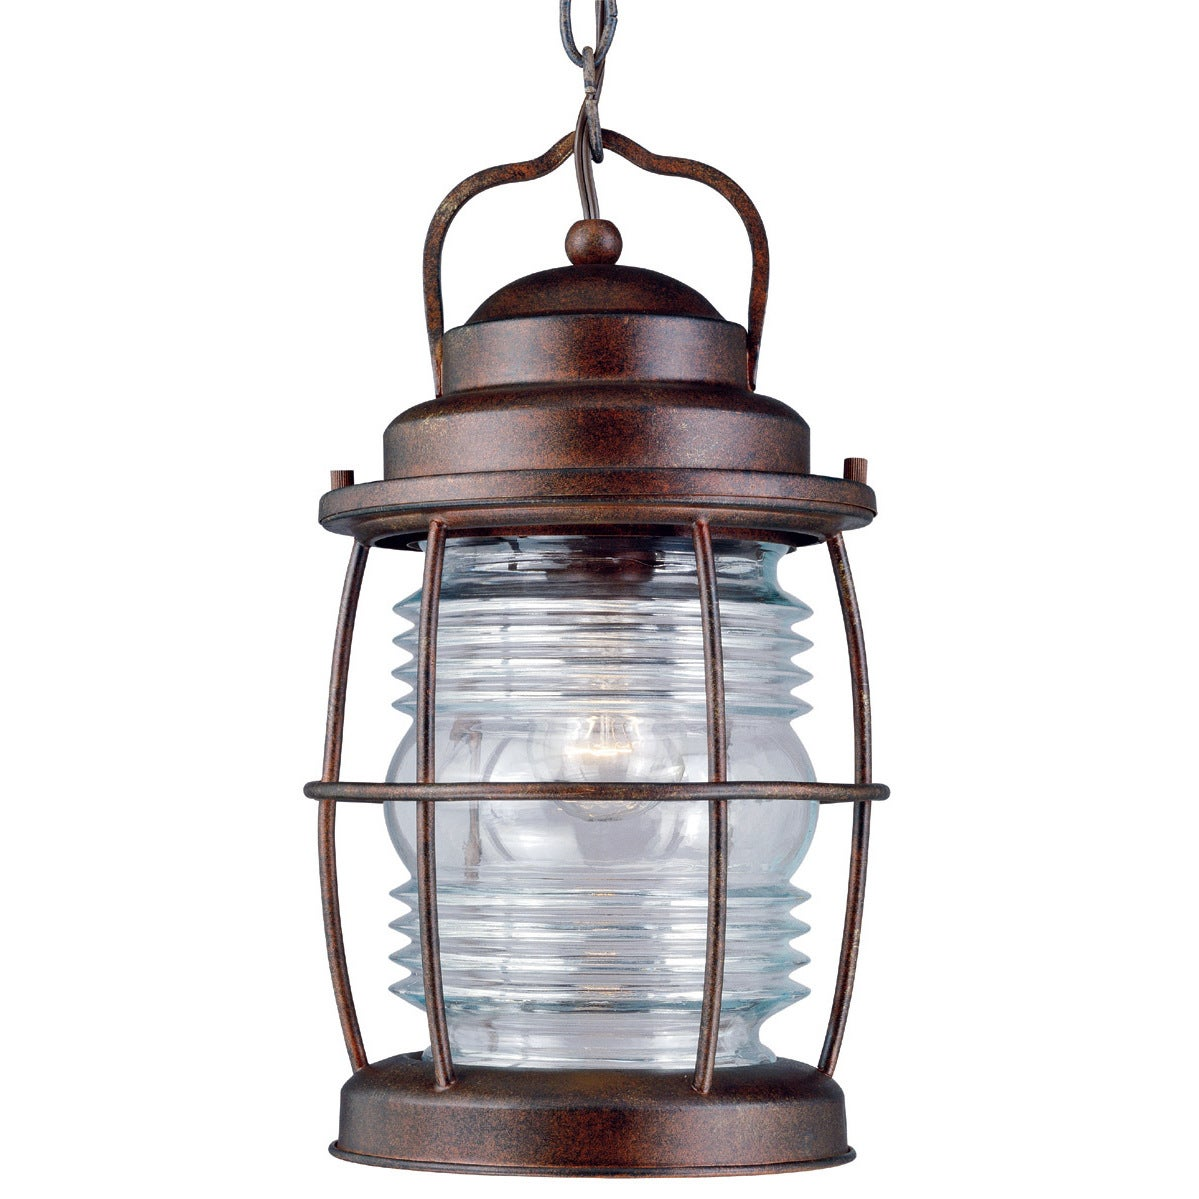 Design Craft Rockledge Medium 1-light Blackened Gilded Co...